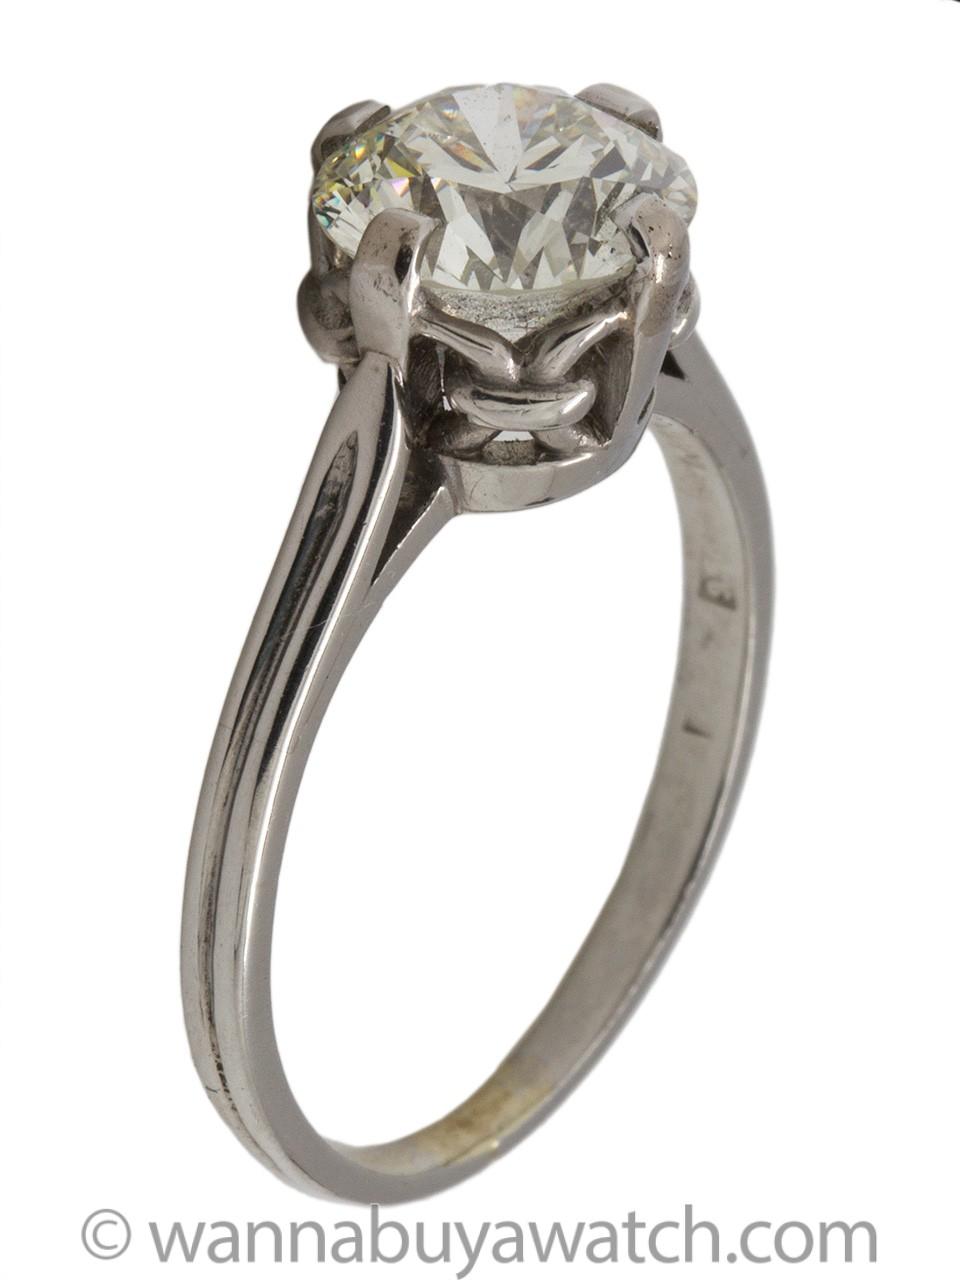 Vintage Engagement Ring Platinum 2.01 Carat Old European Cut J-VS1 circa 1920s